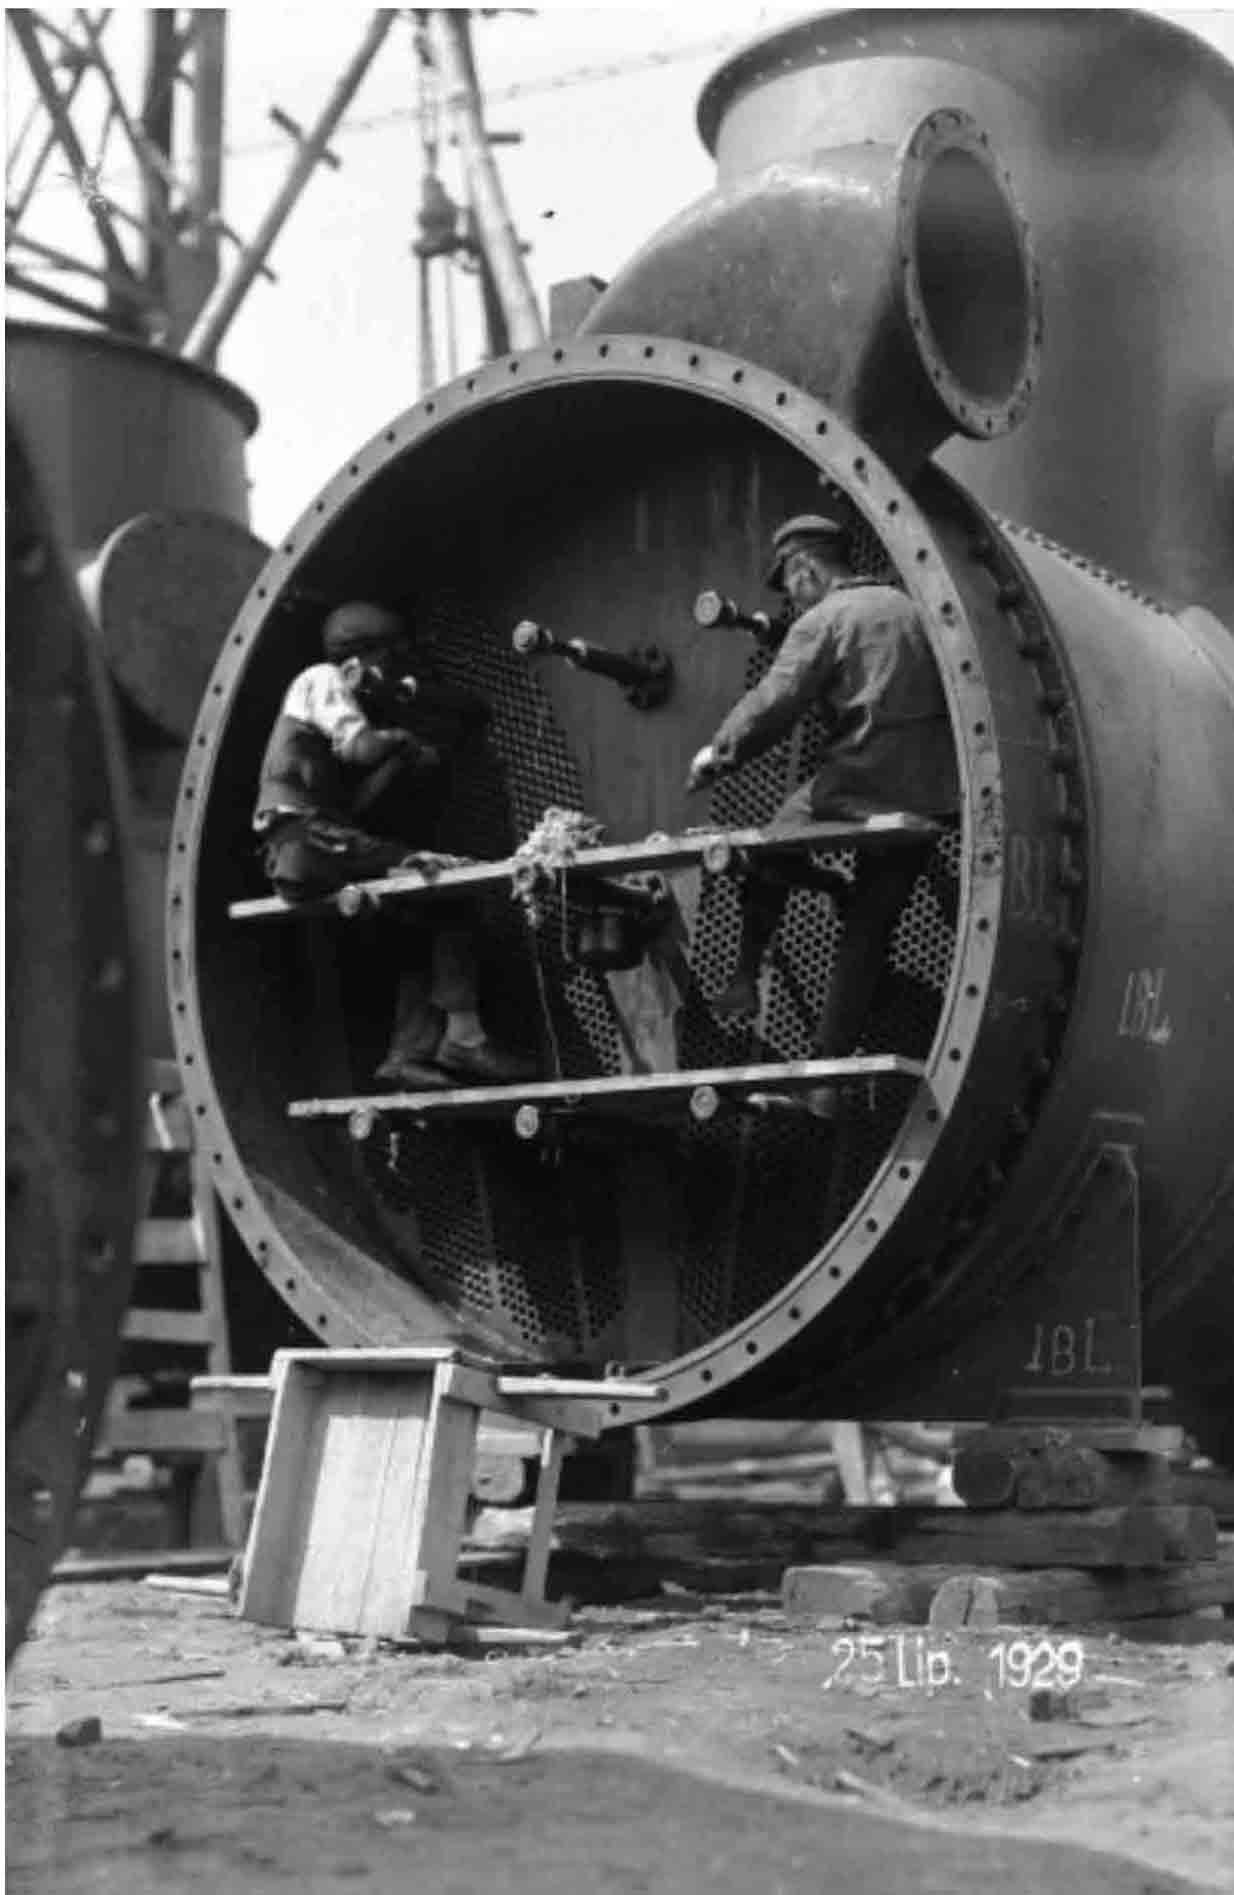 Pracownicy podczas pracy, Łódź 25 lipca 1929